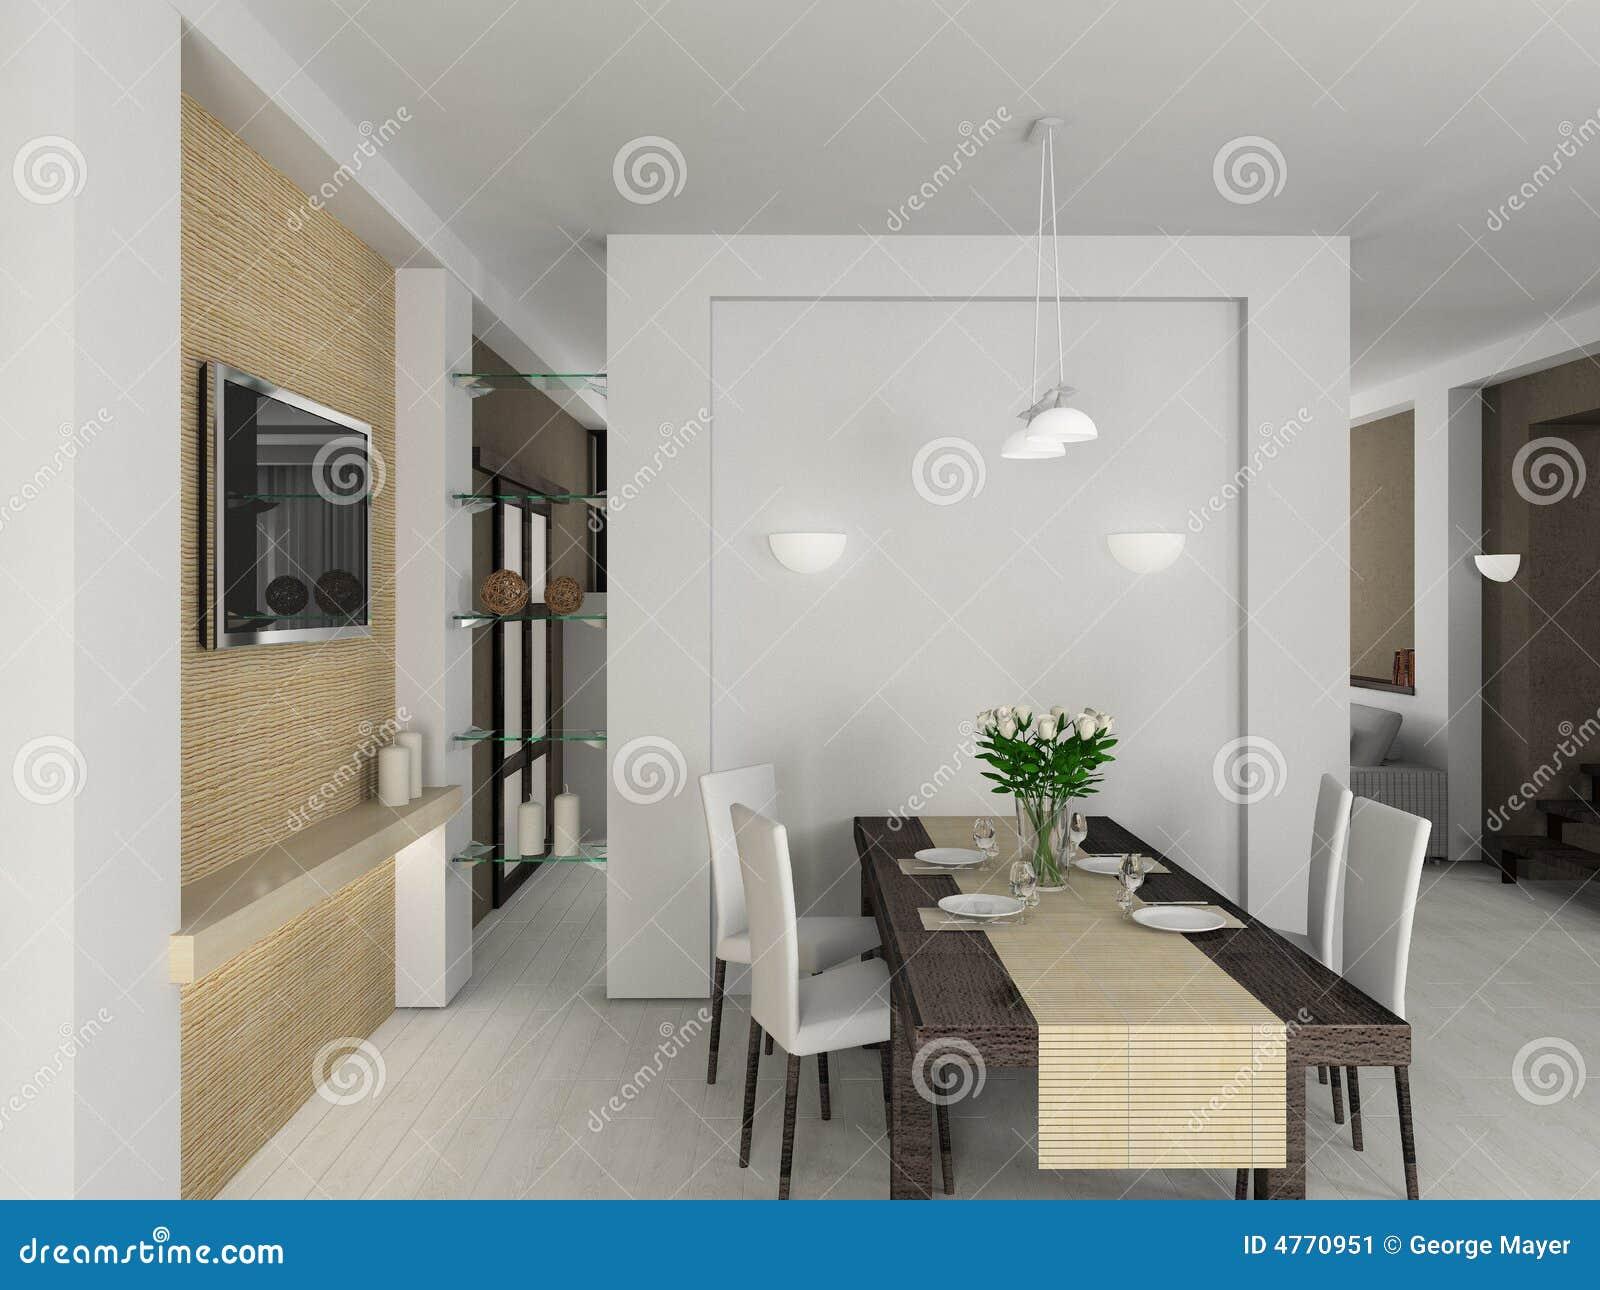 D geef modern binnenland van eetkamer terug stock afbeelding